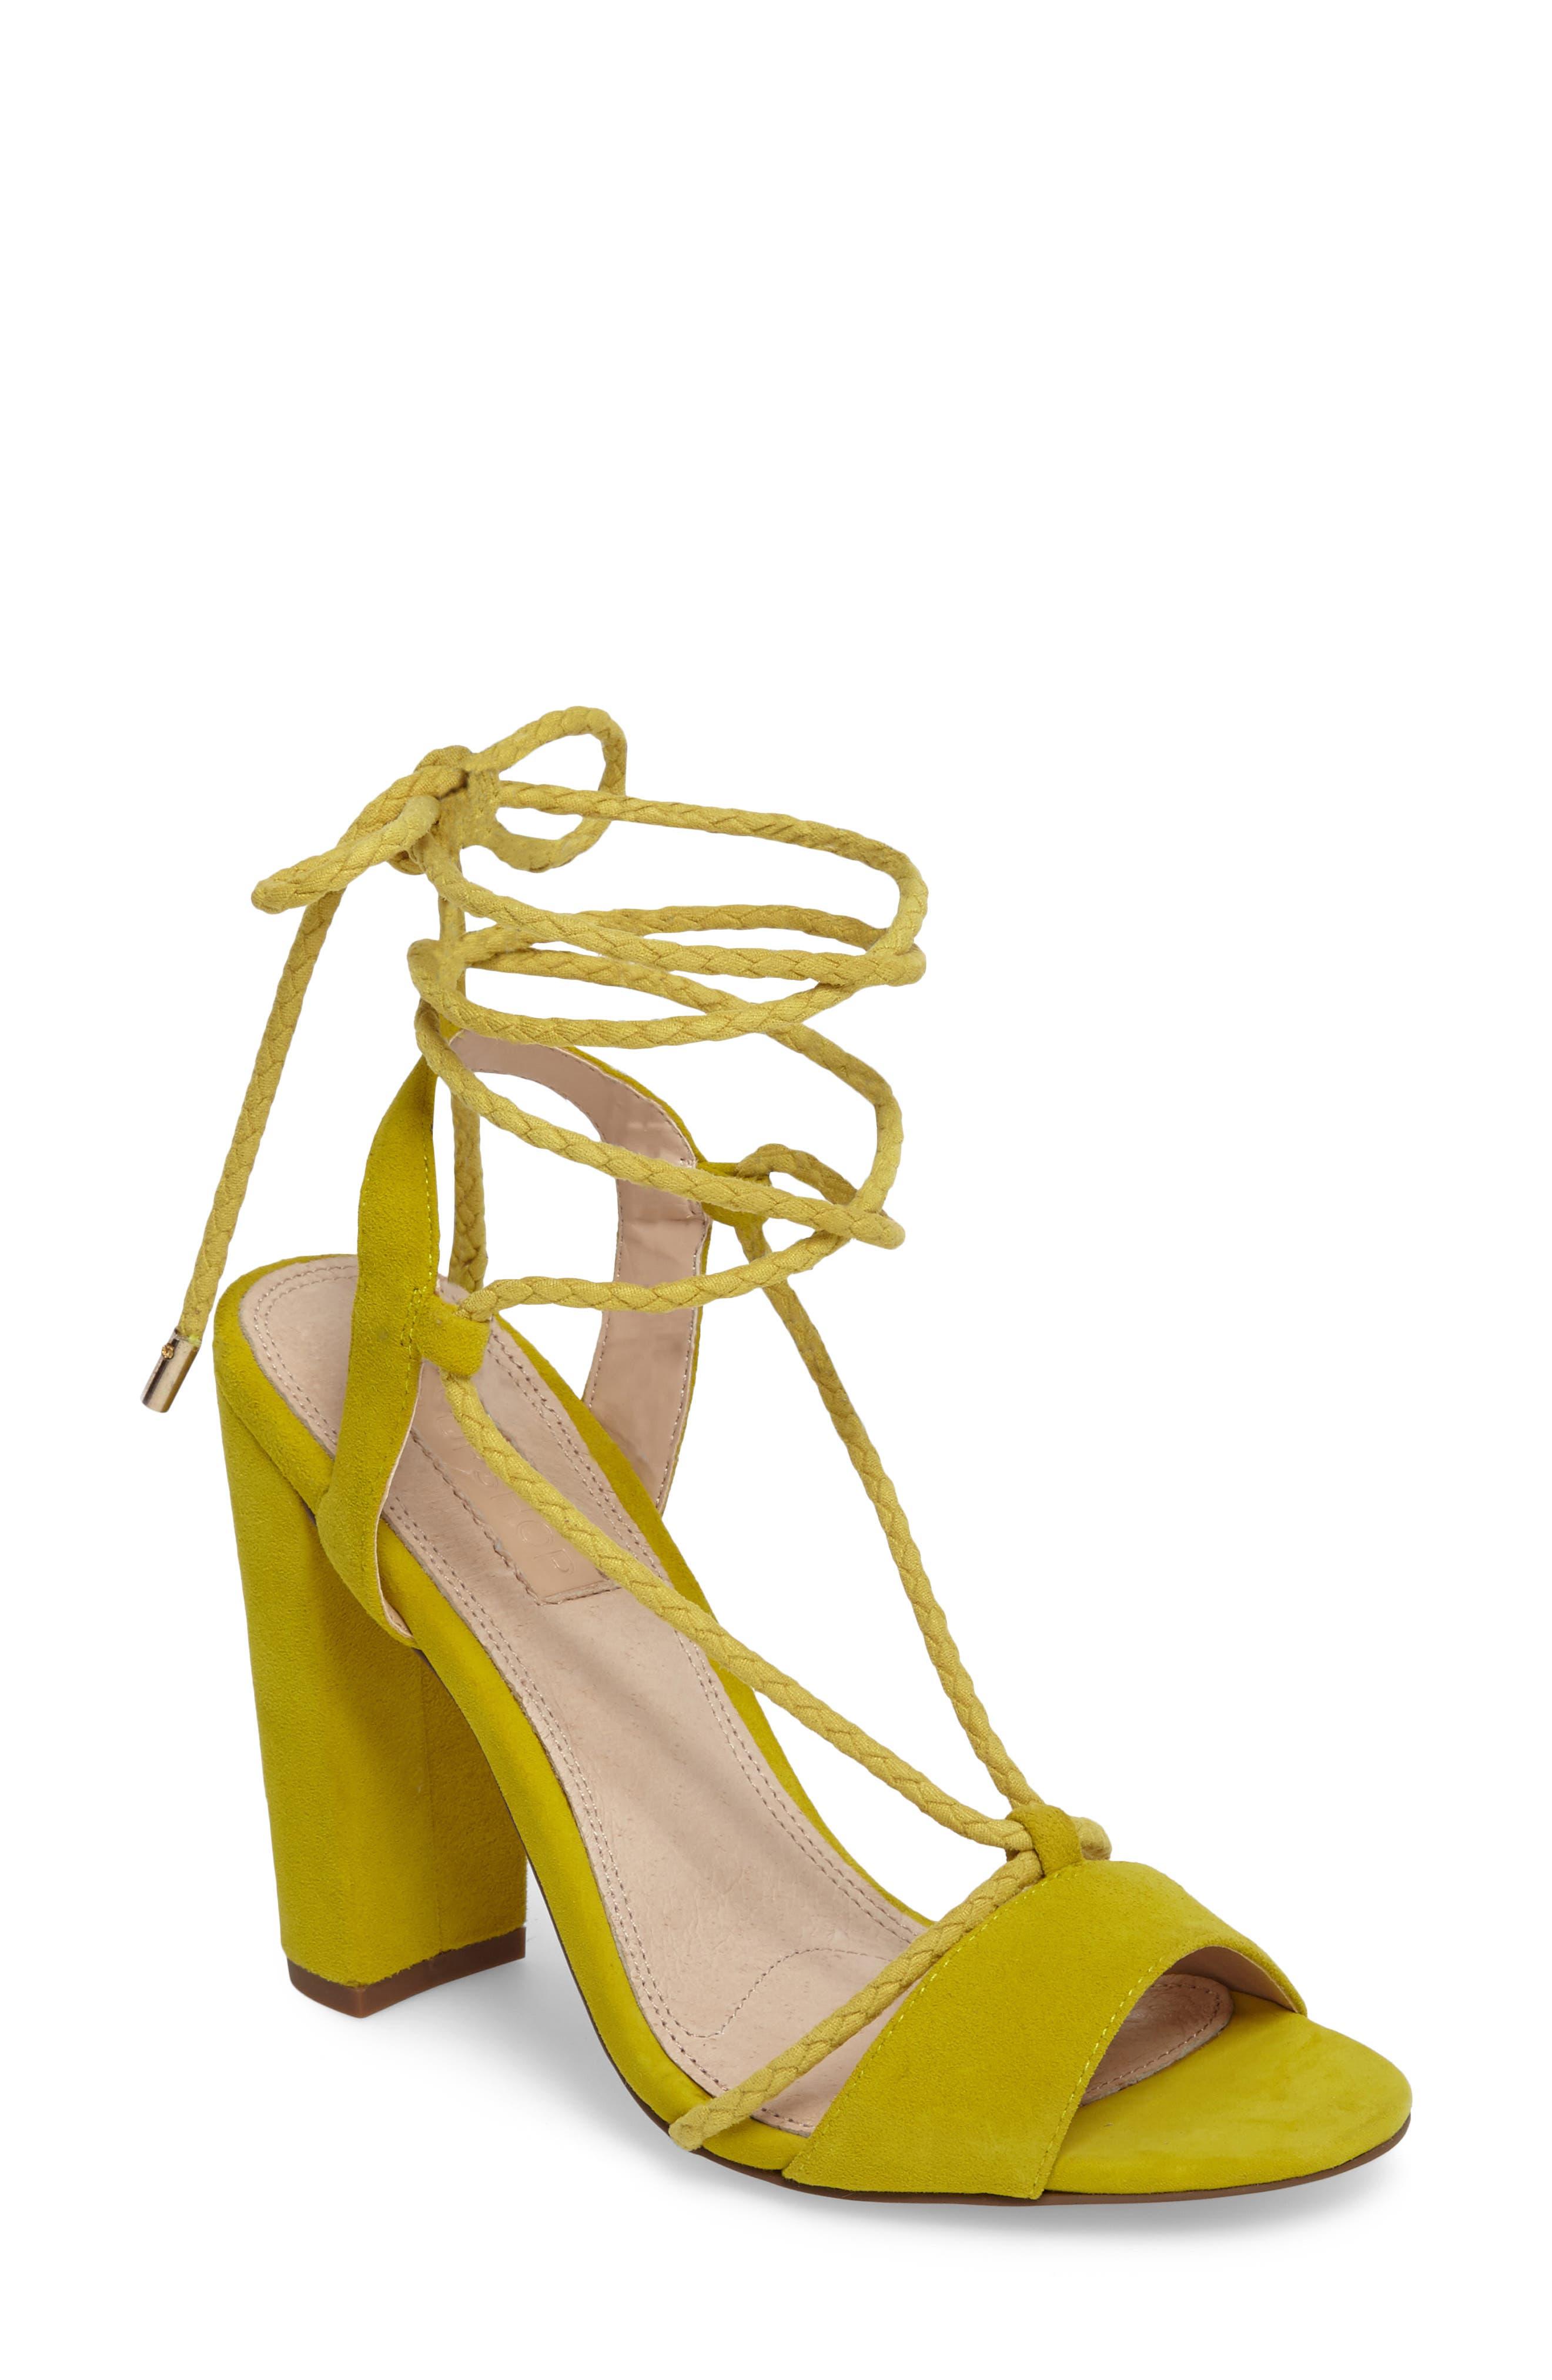 TOPSHOP Reno Ankle Tie Sandal